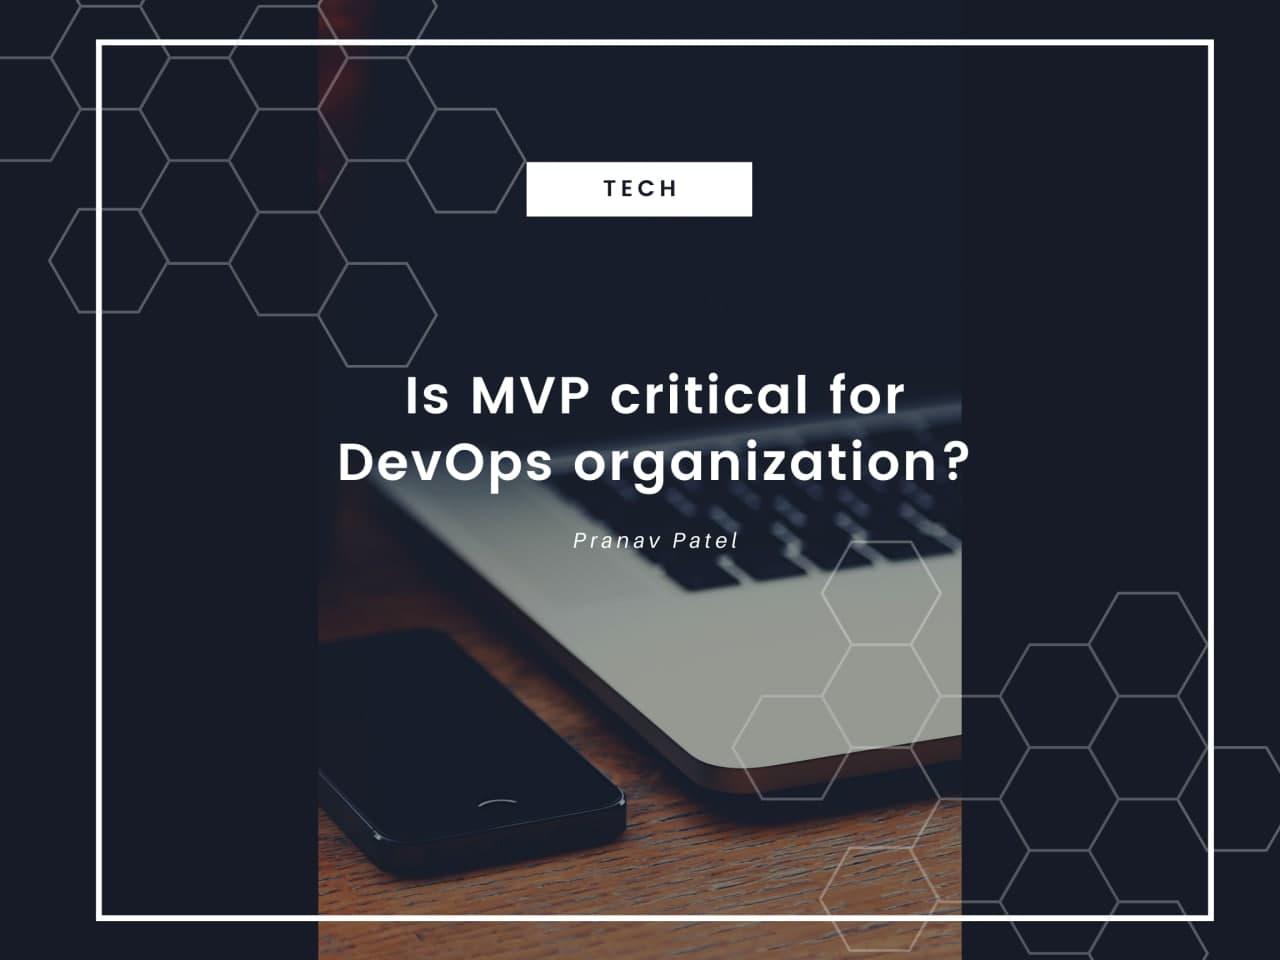 MVP critical for DevOps organization